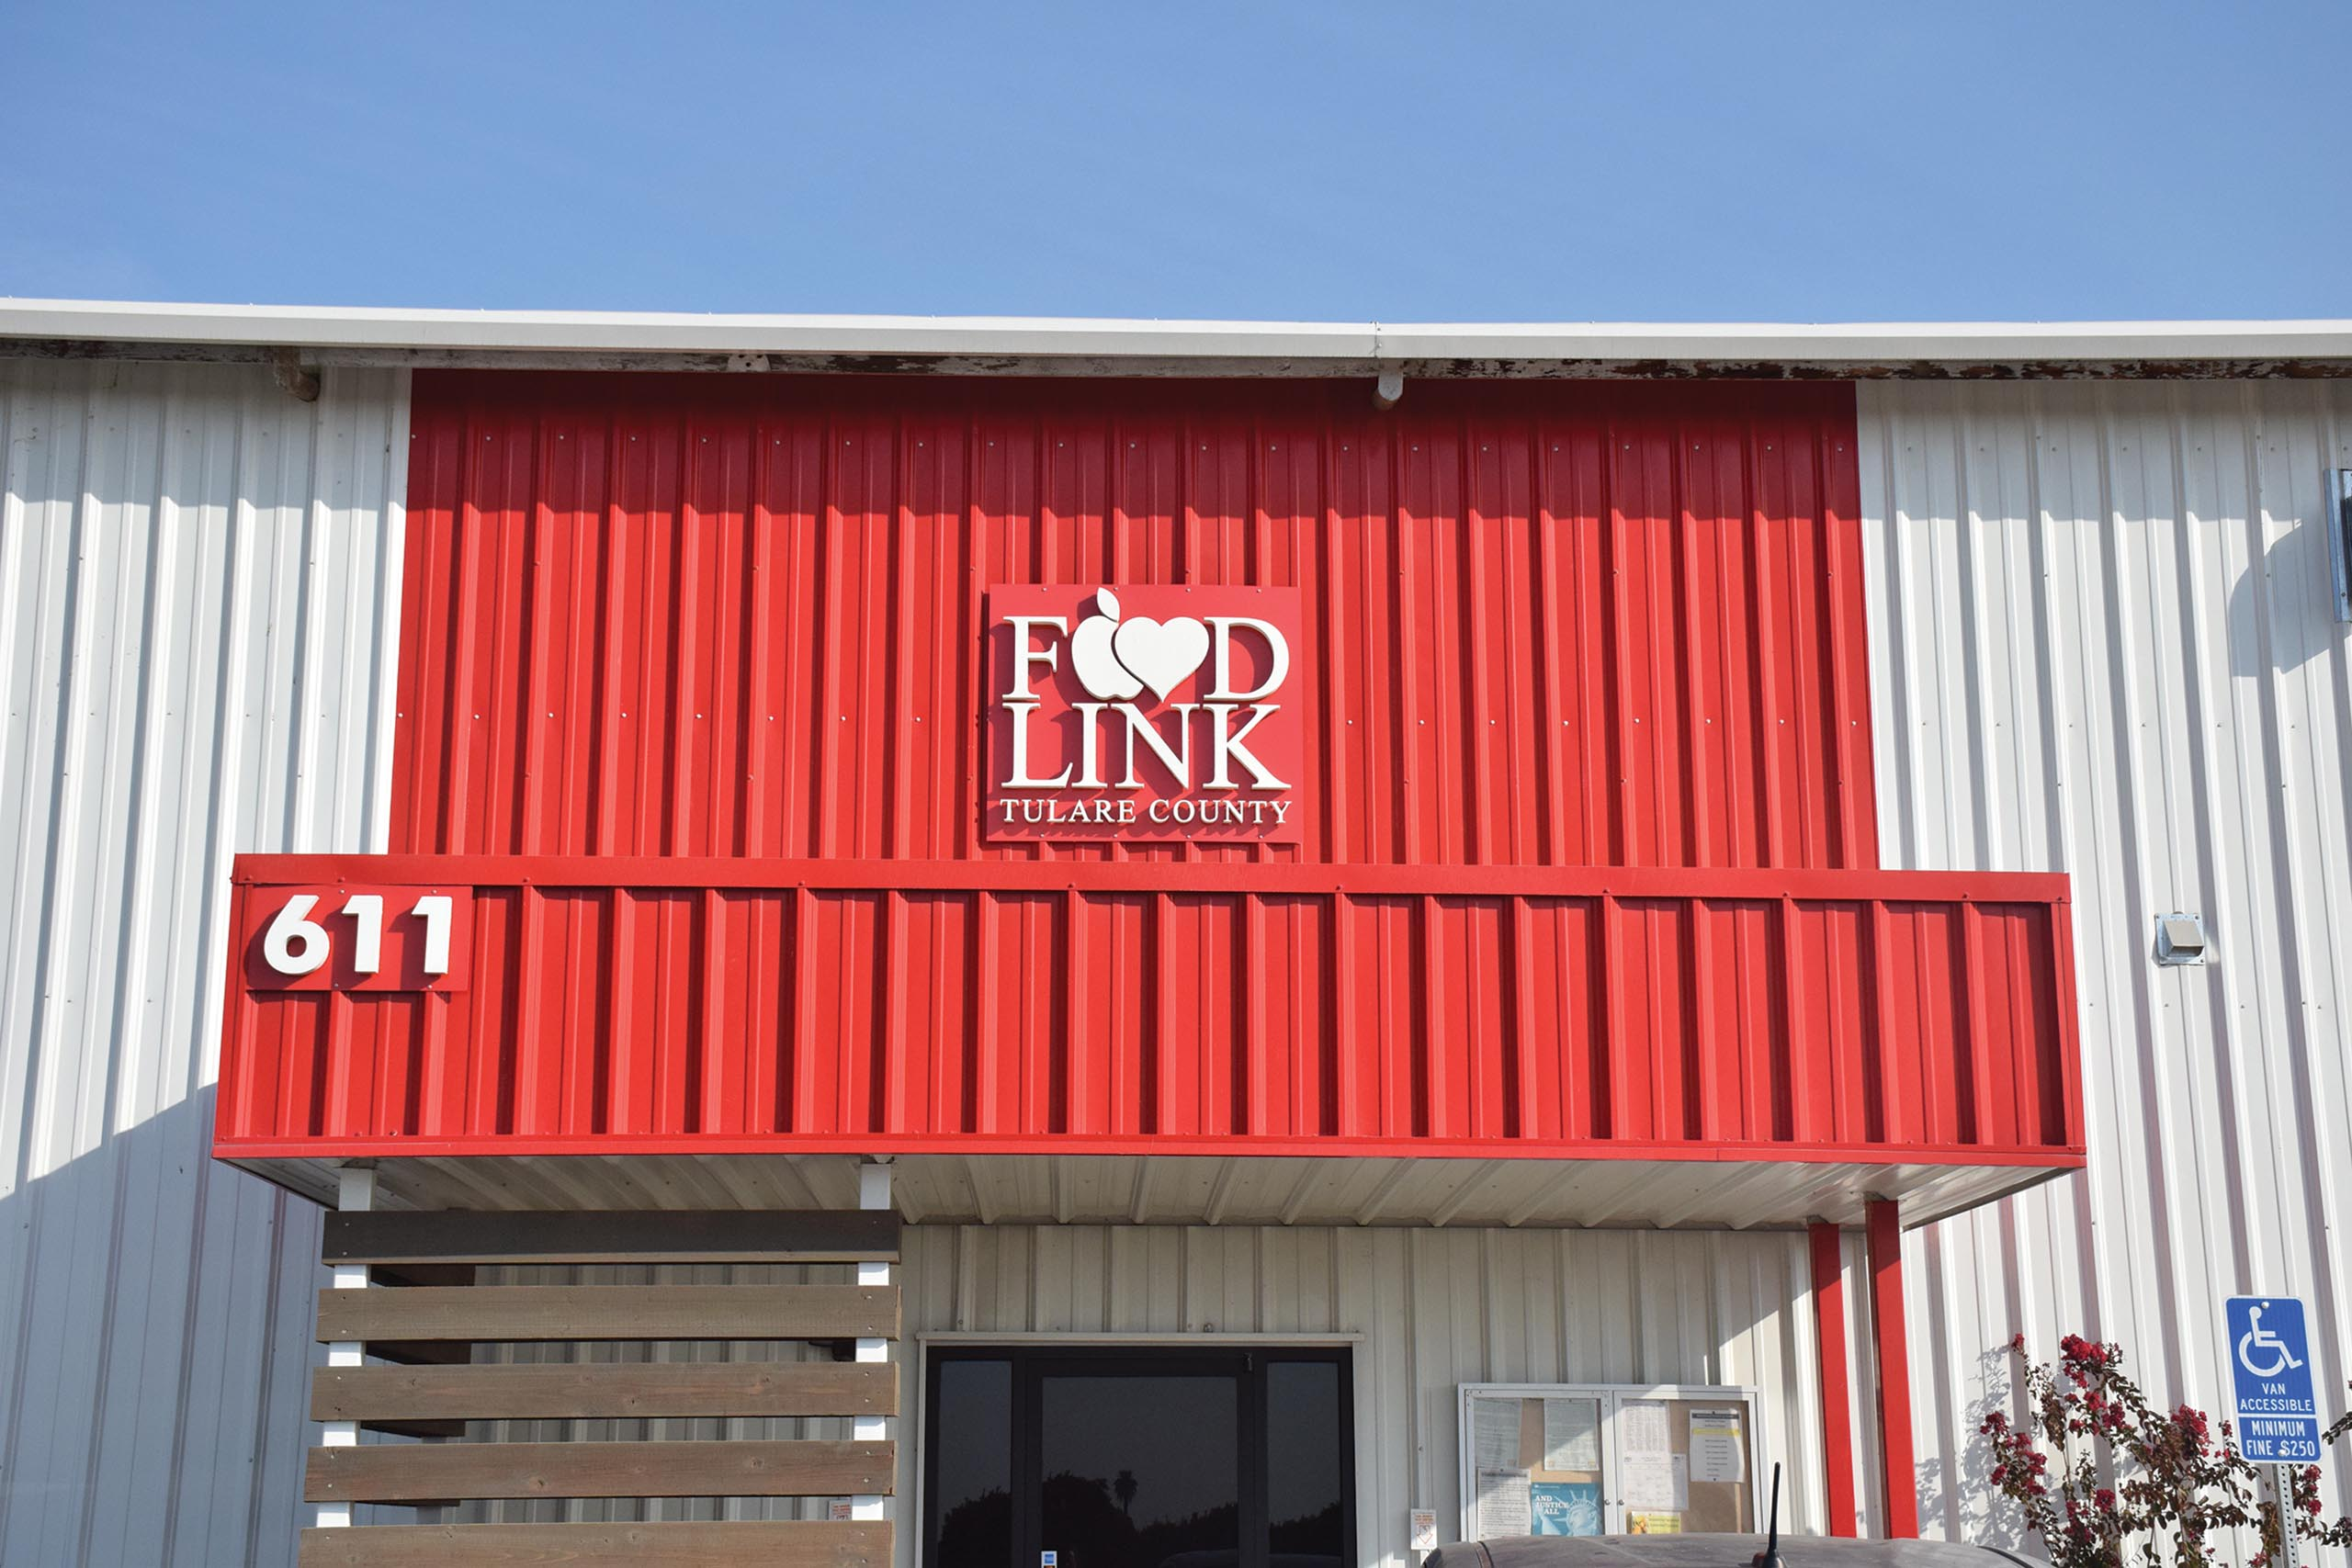 kw-front-foodlink